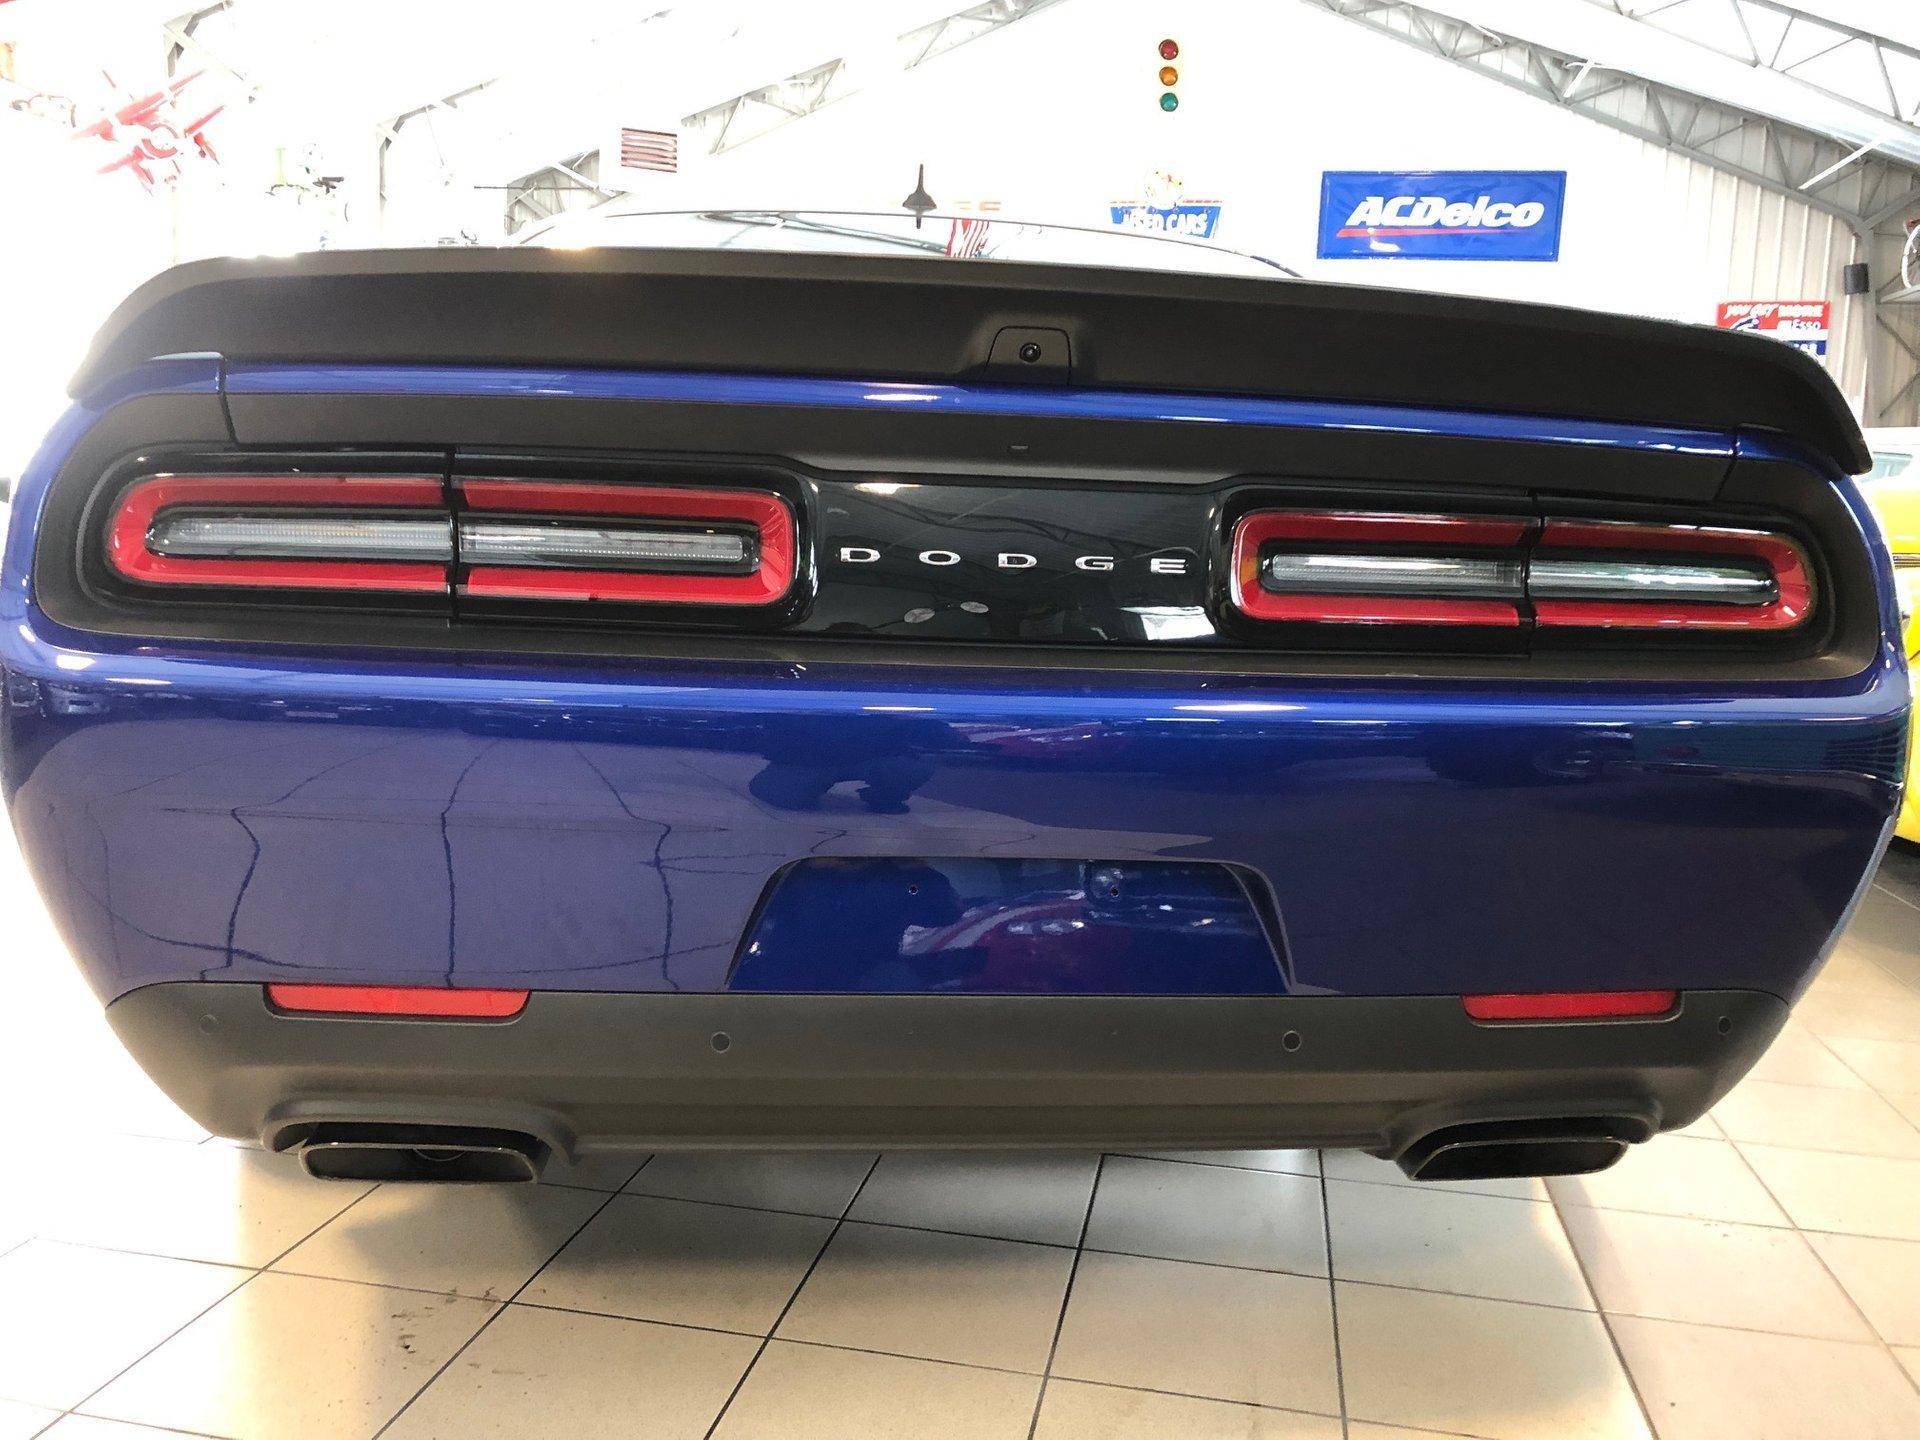 2019 Dodge Challenger SRT Hellcat Redeye for sale #116625 | MCG